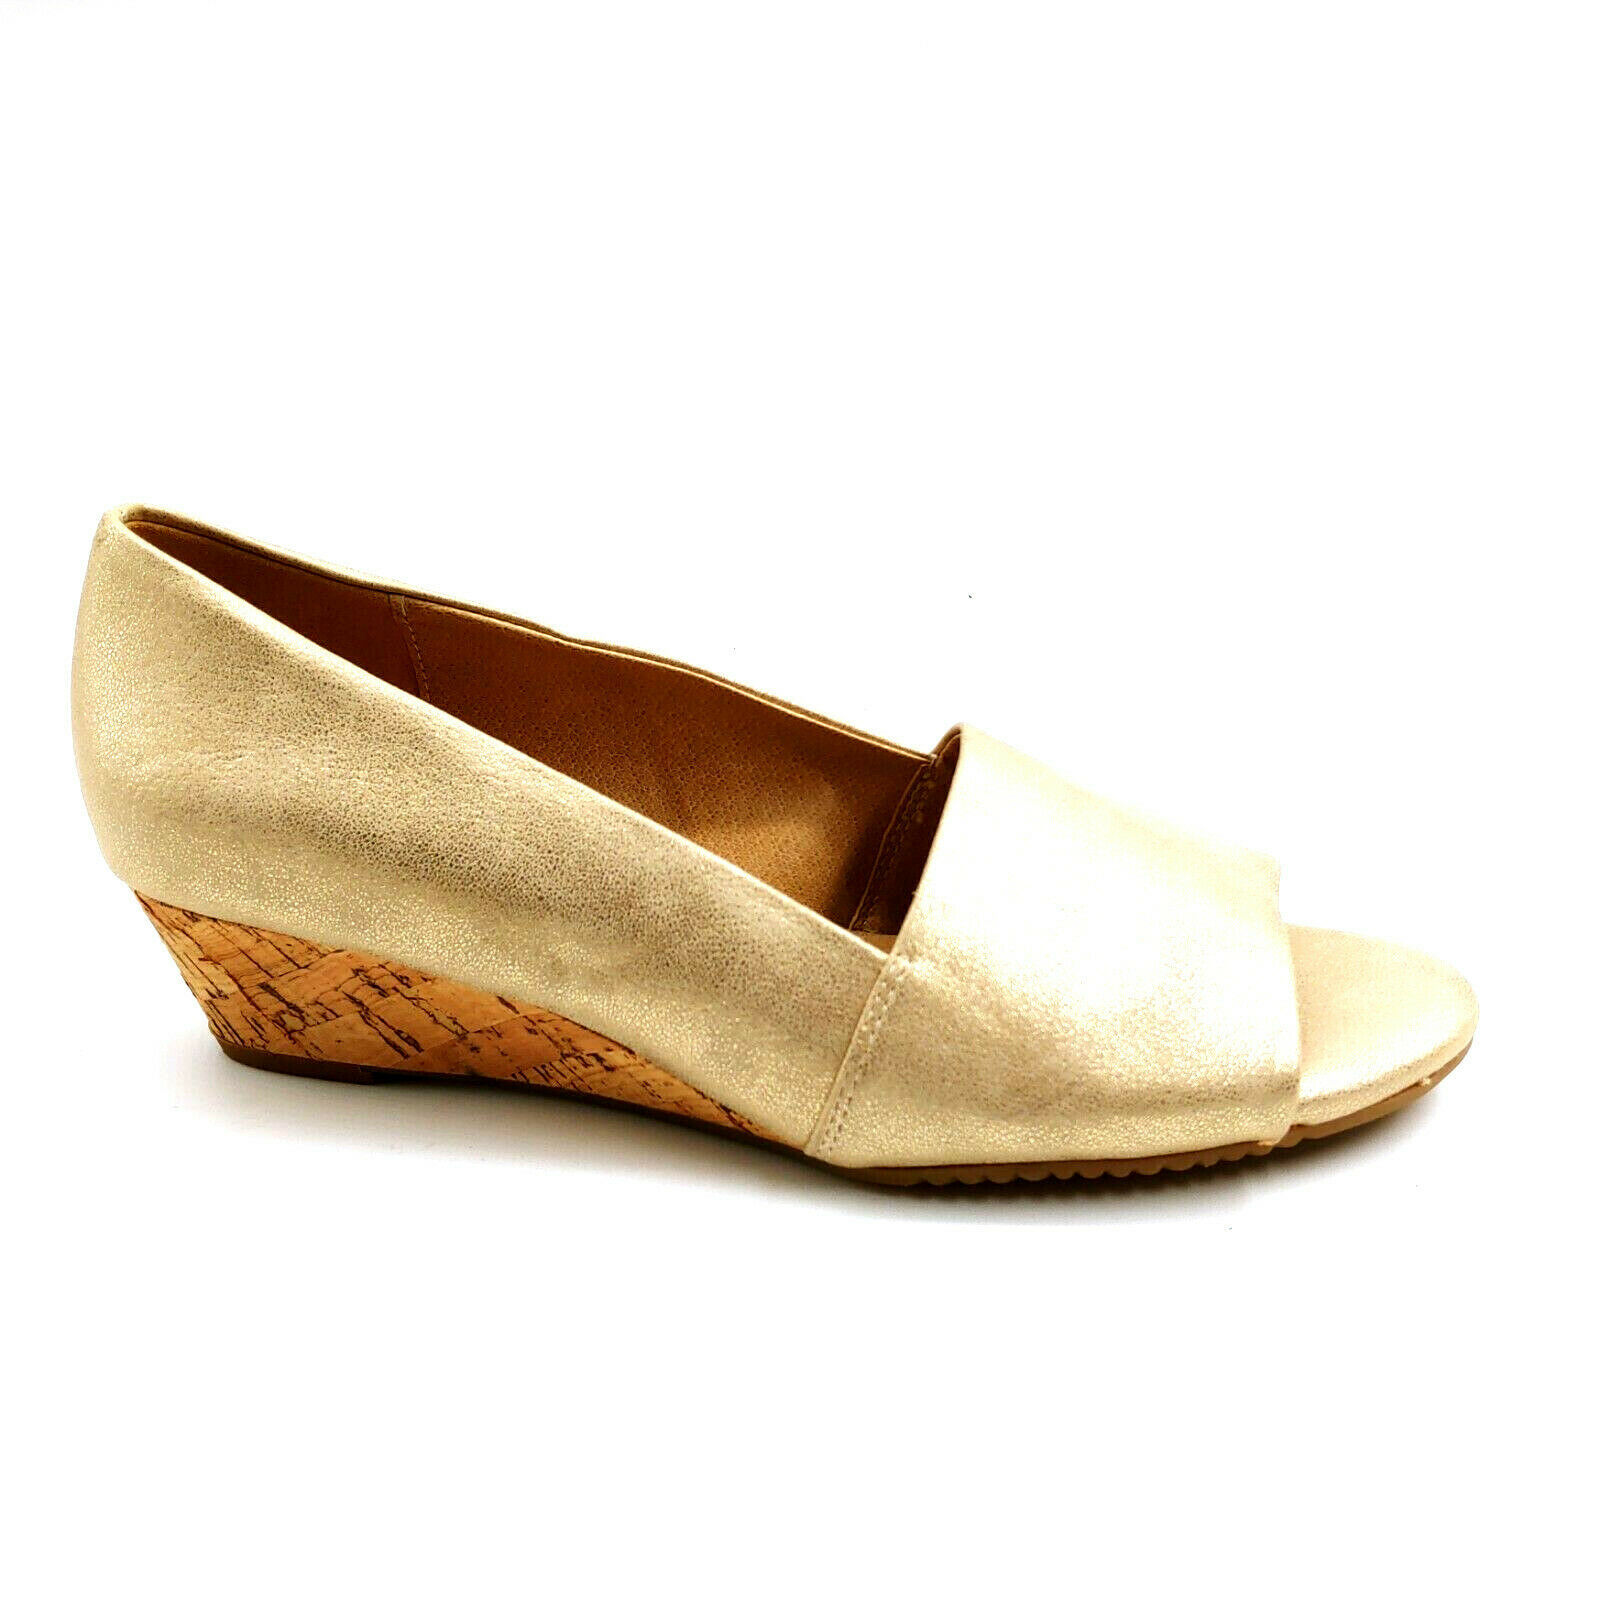 Aerosoles Womans Application Wedge Slide Sandals Gold Cushioned Sz 8.5 M NEW - $37.61